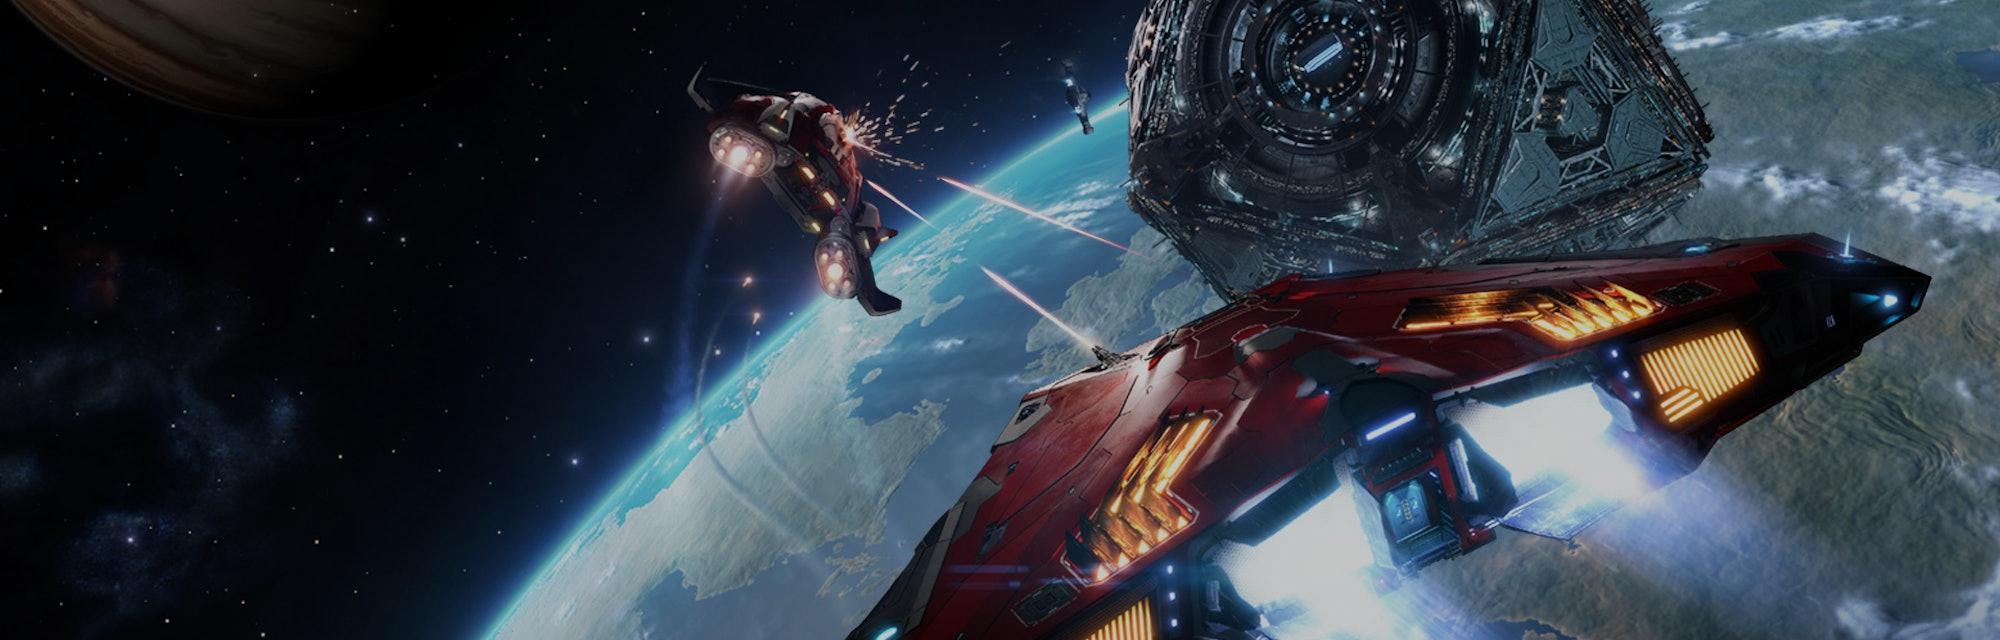 A screenshot of gameplay in Elite Dangerous